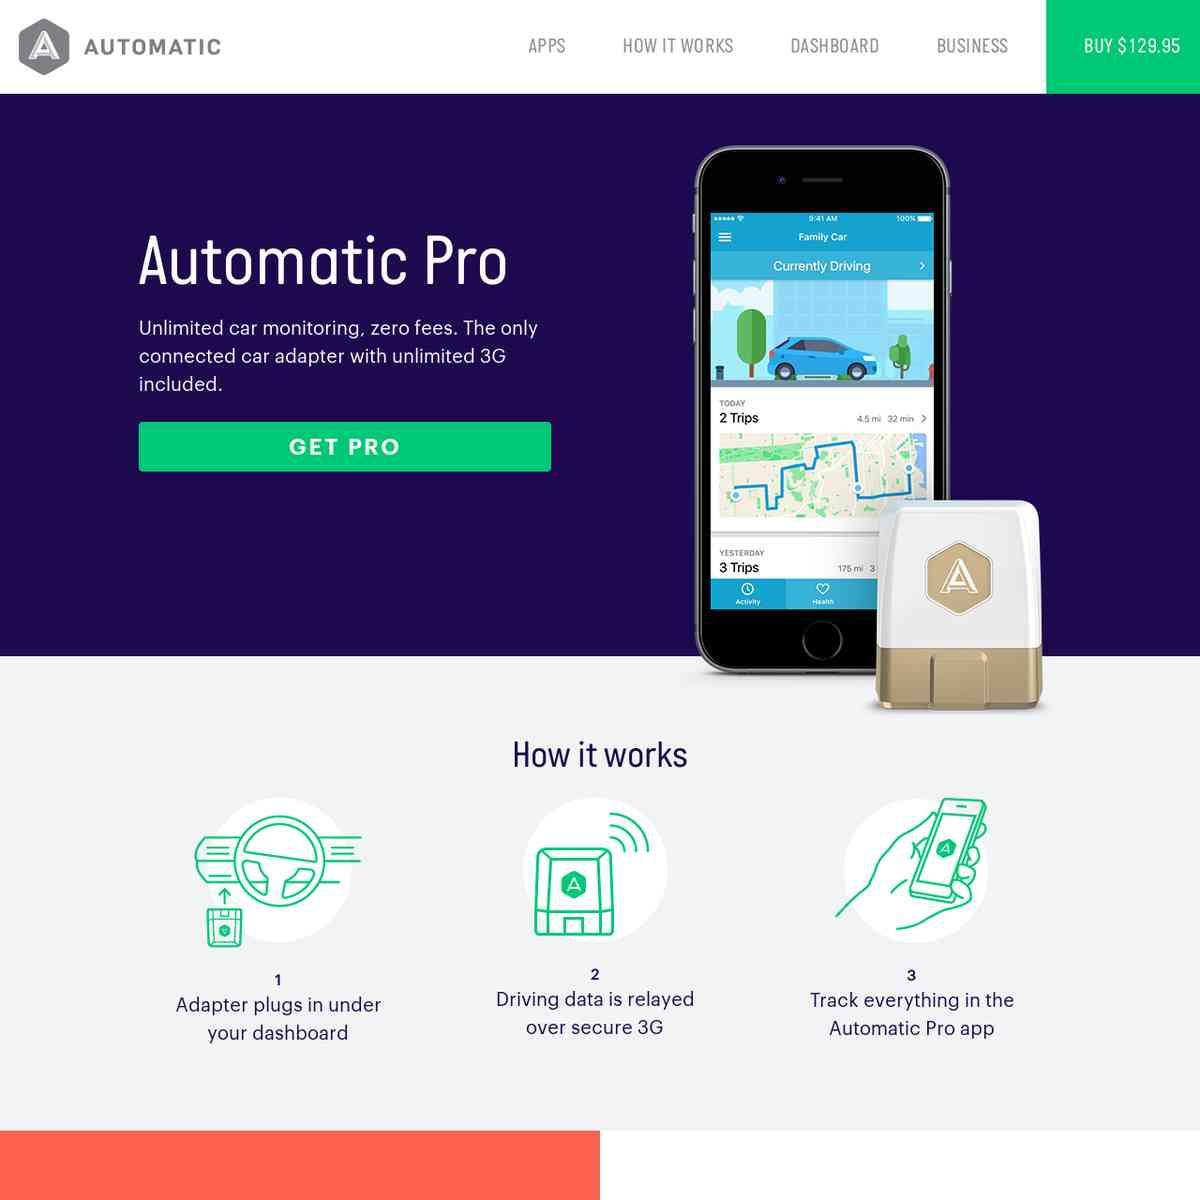 automatic.com